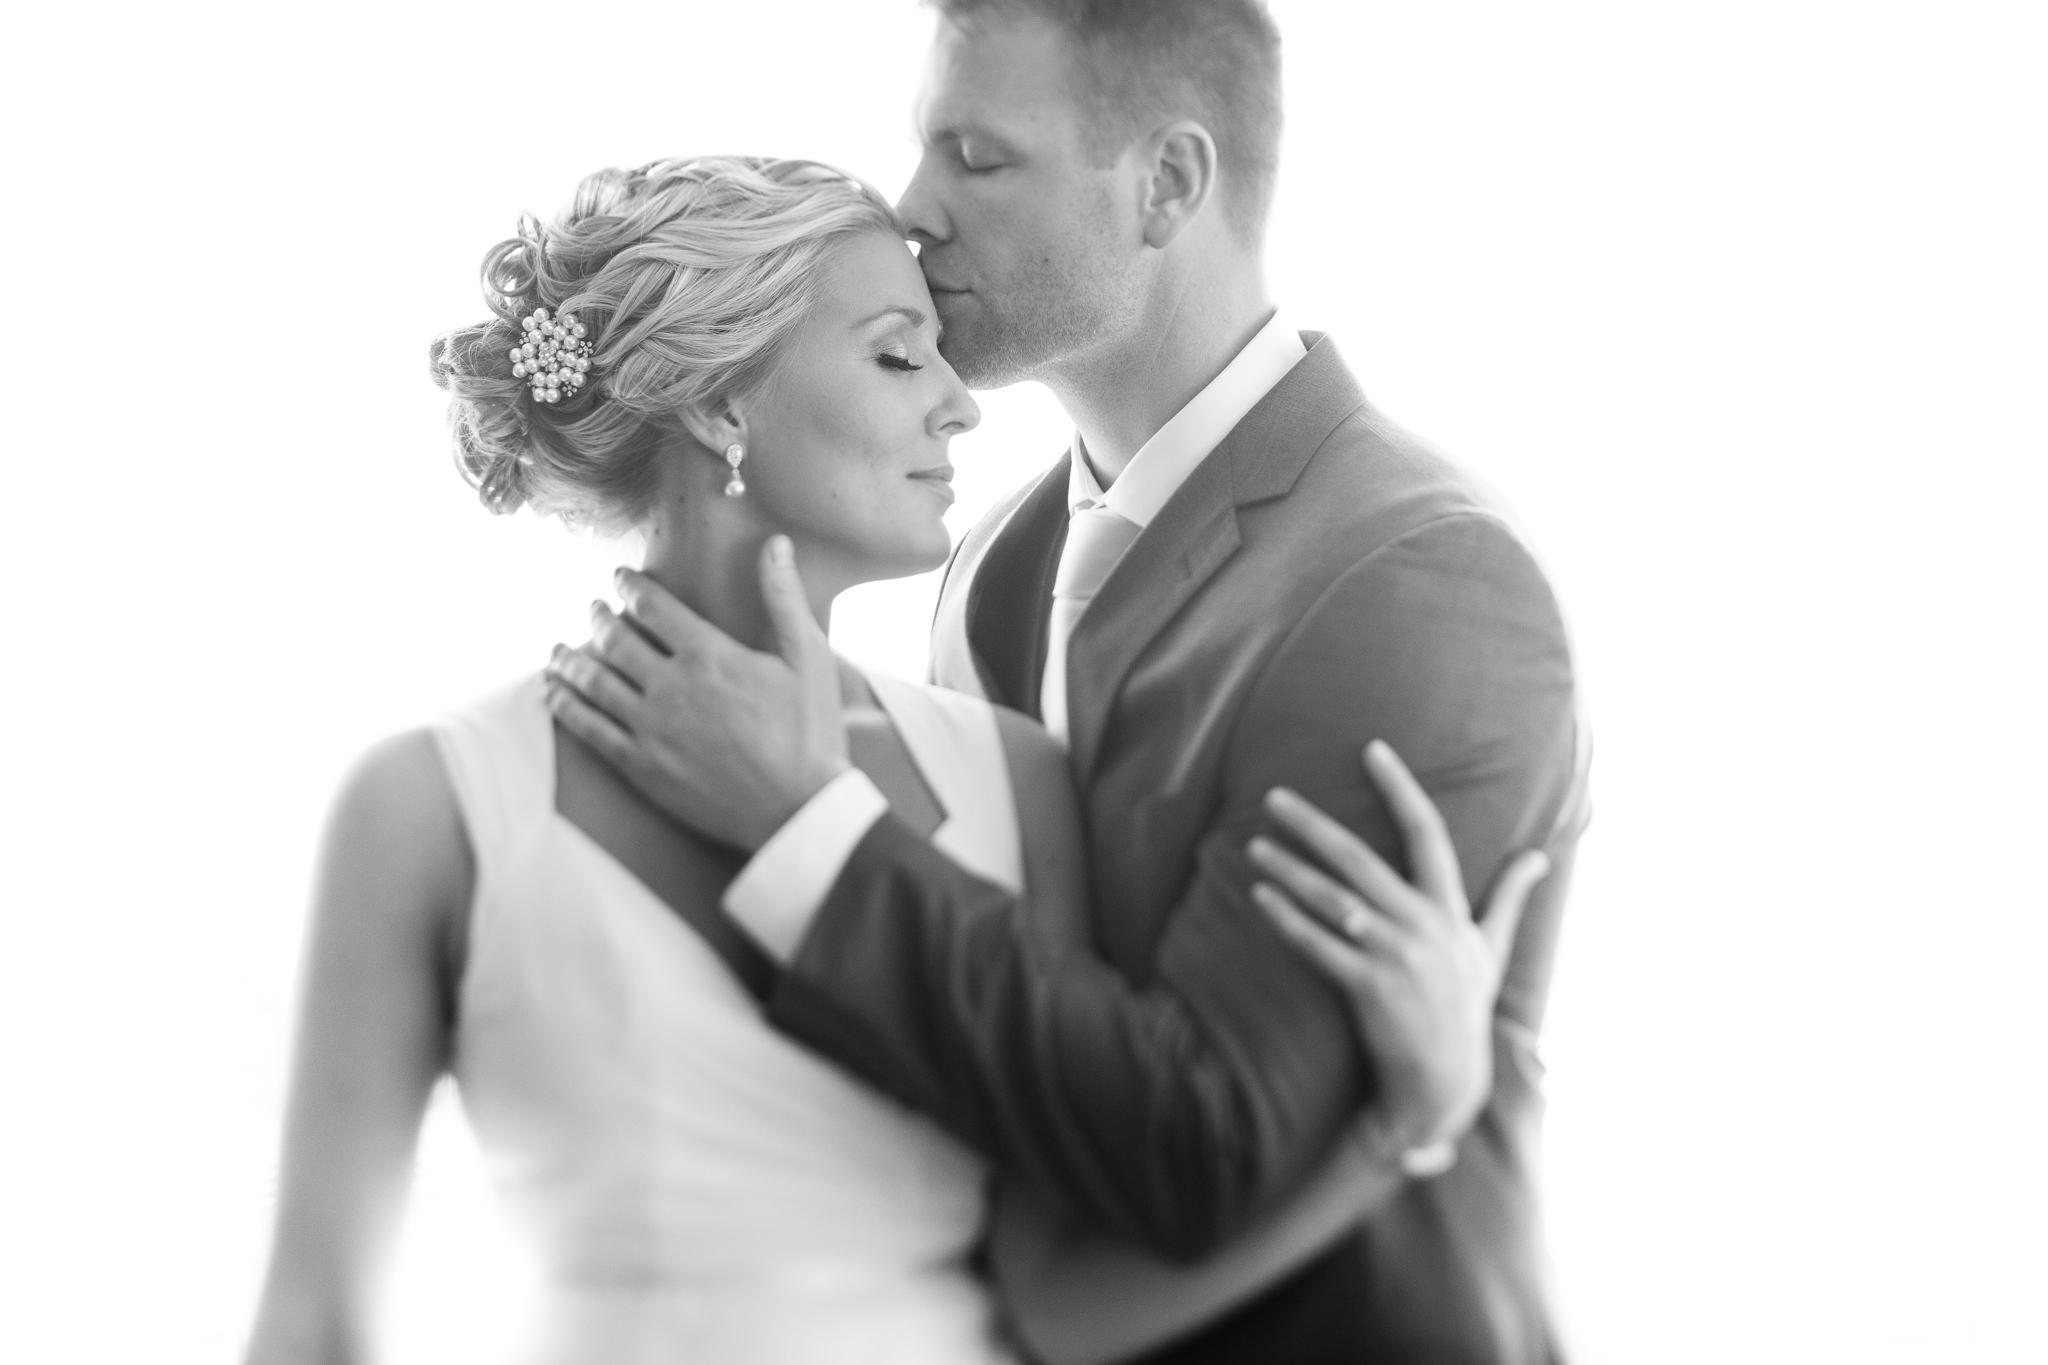 wedding photography class, backlit glowy portrait of bride and groom